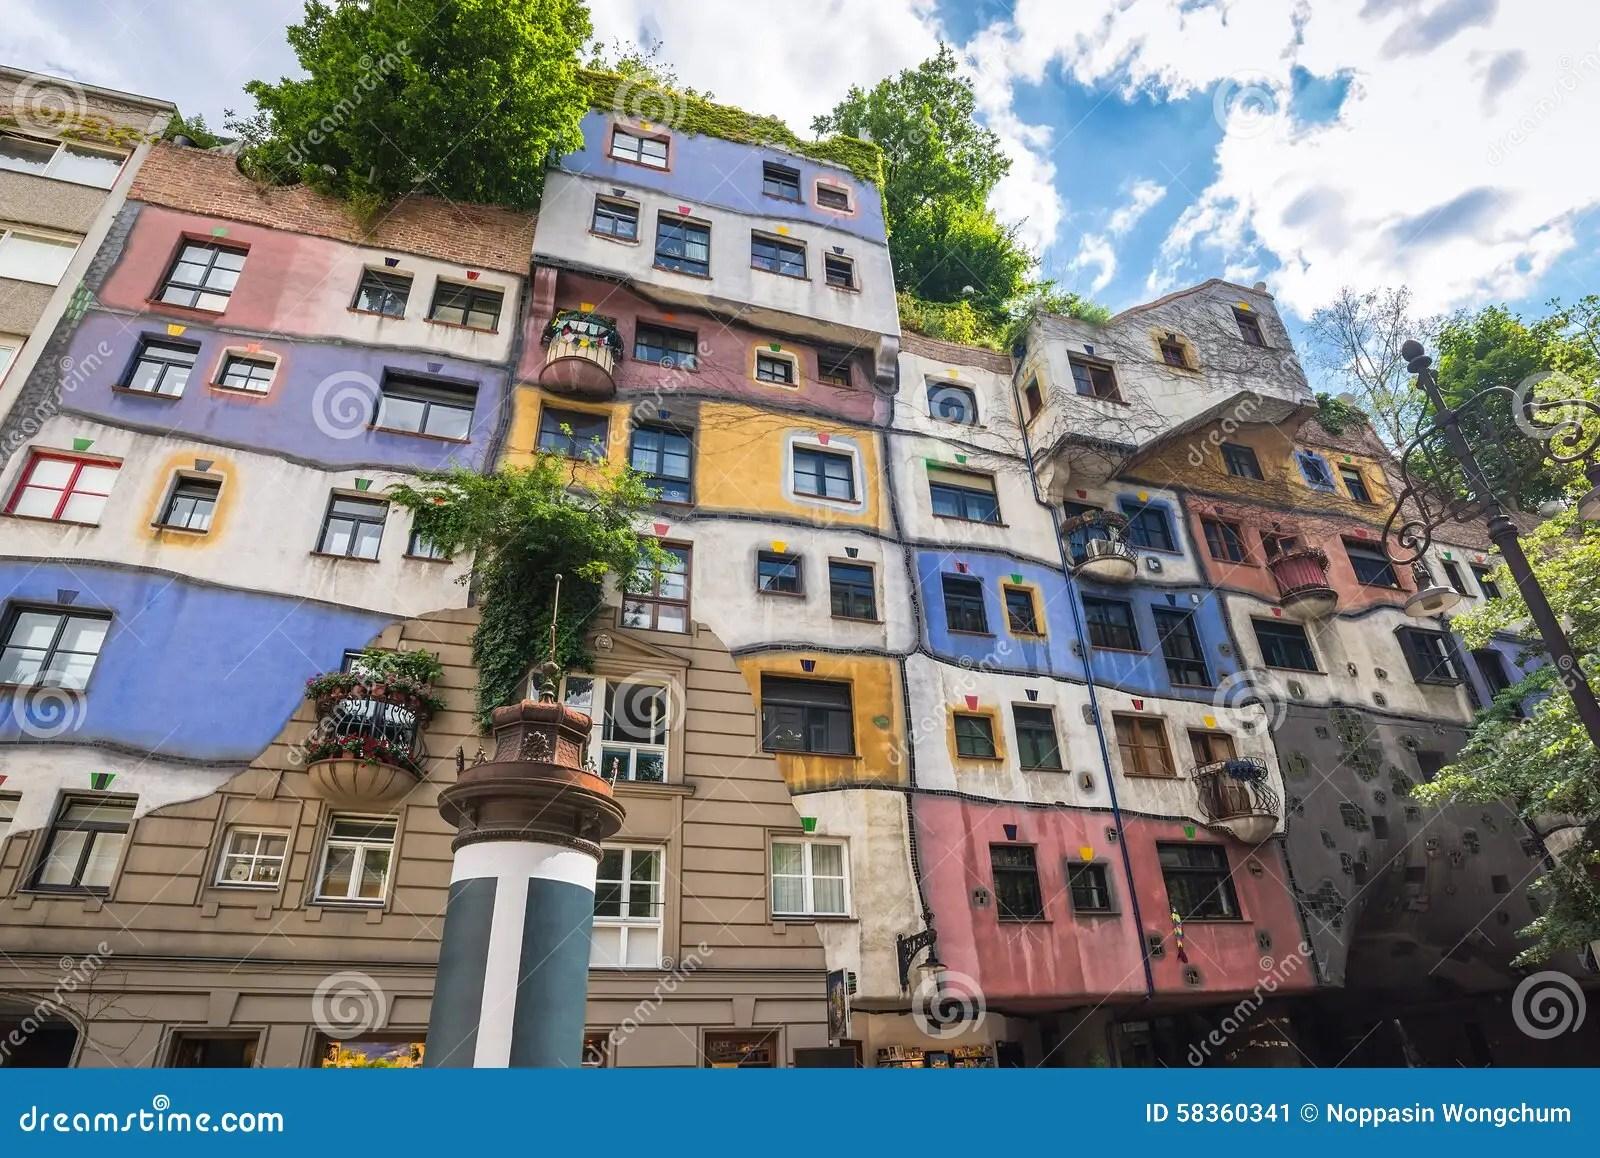 Hundertwasser House - Vienna - Austria Stock Image - Image of city, austria: 58360341